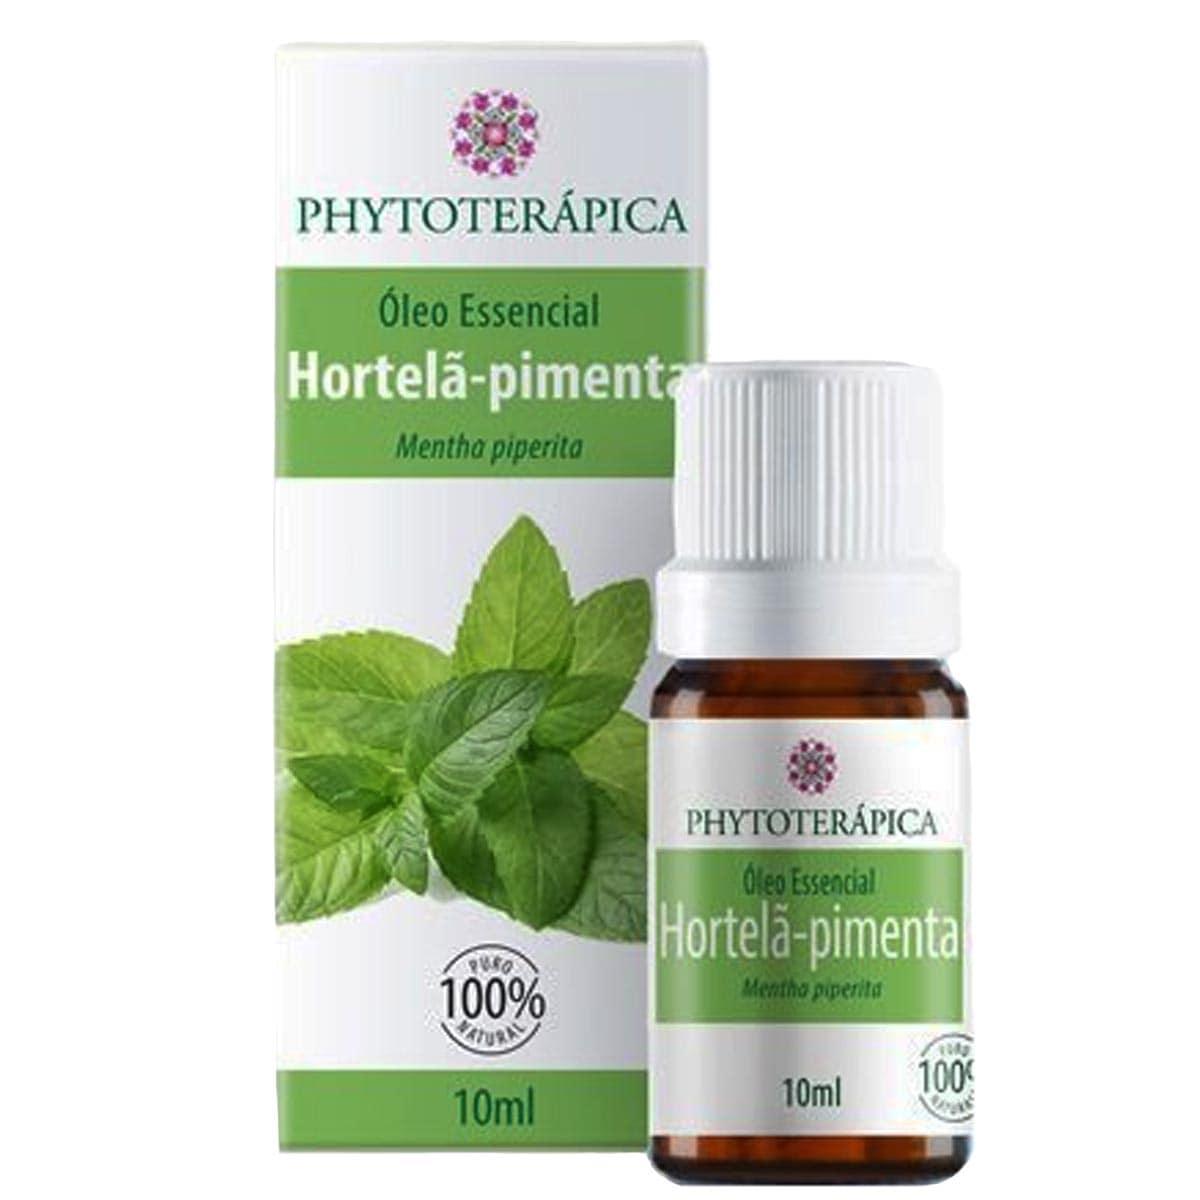 Óleo Essencial Hortelã Pimenta Mentha Piperita 10ml Phytoterapica